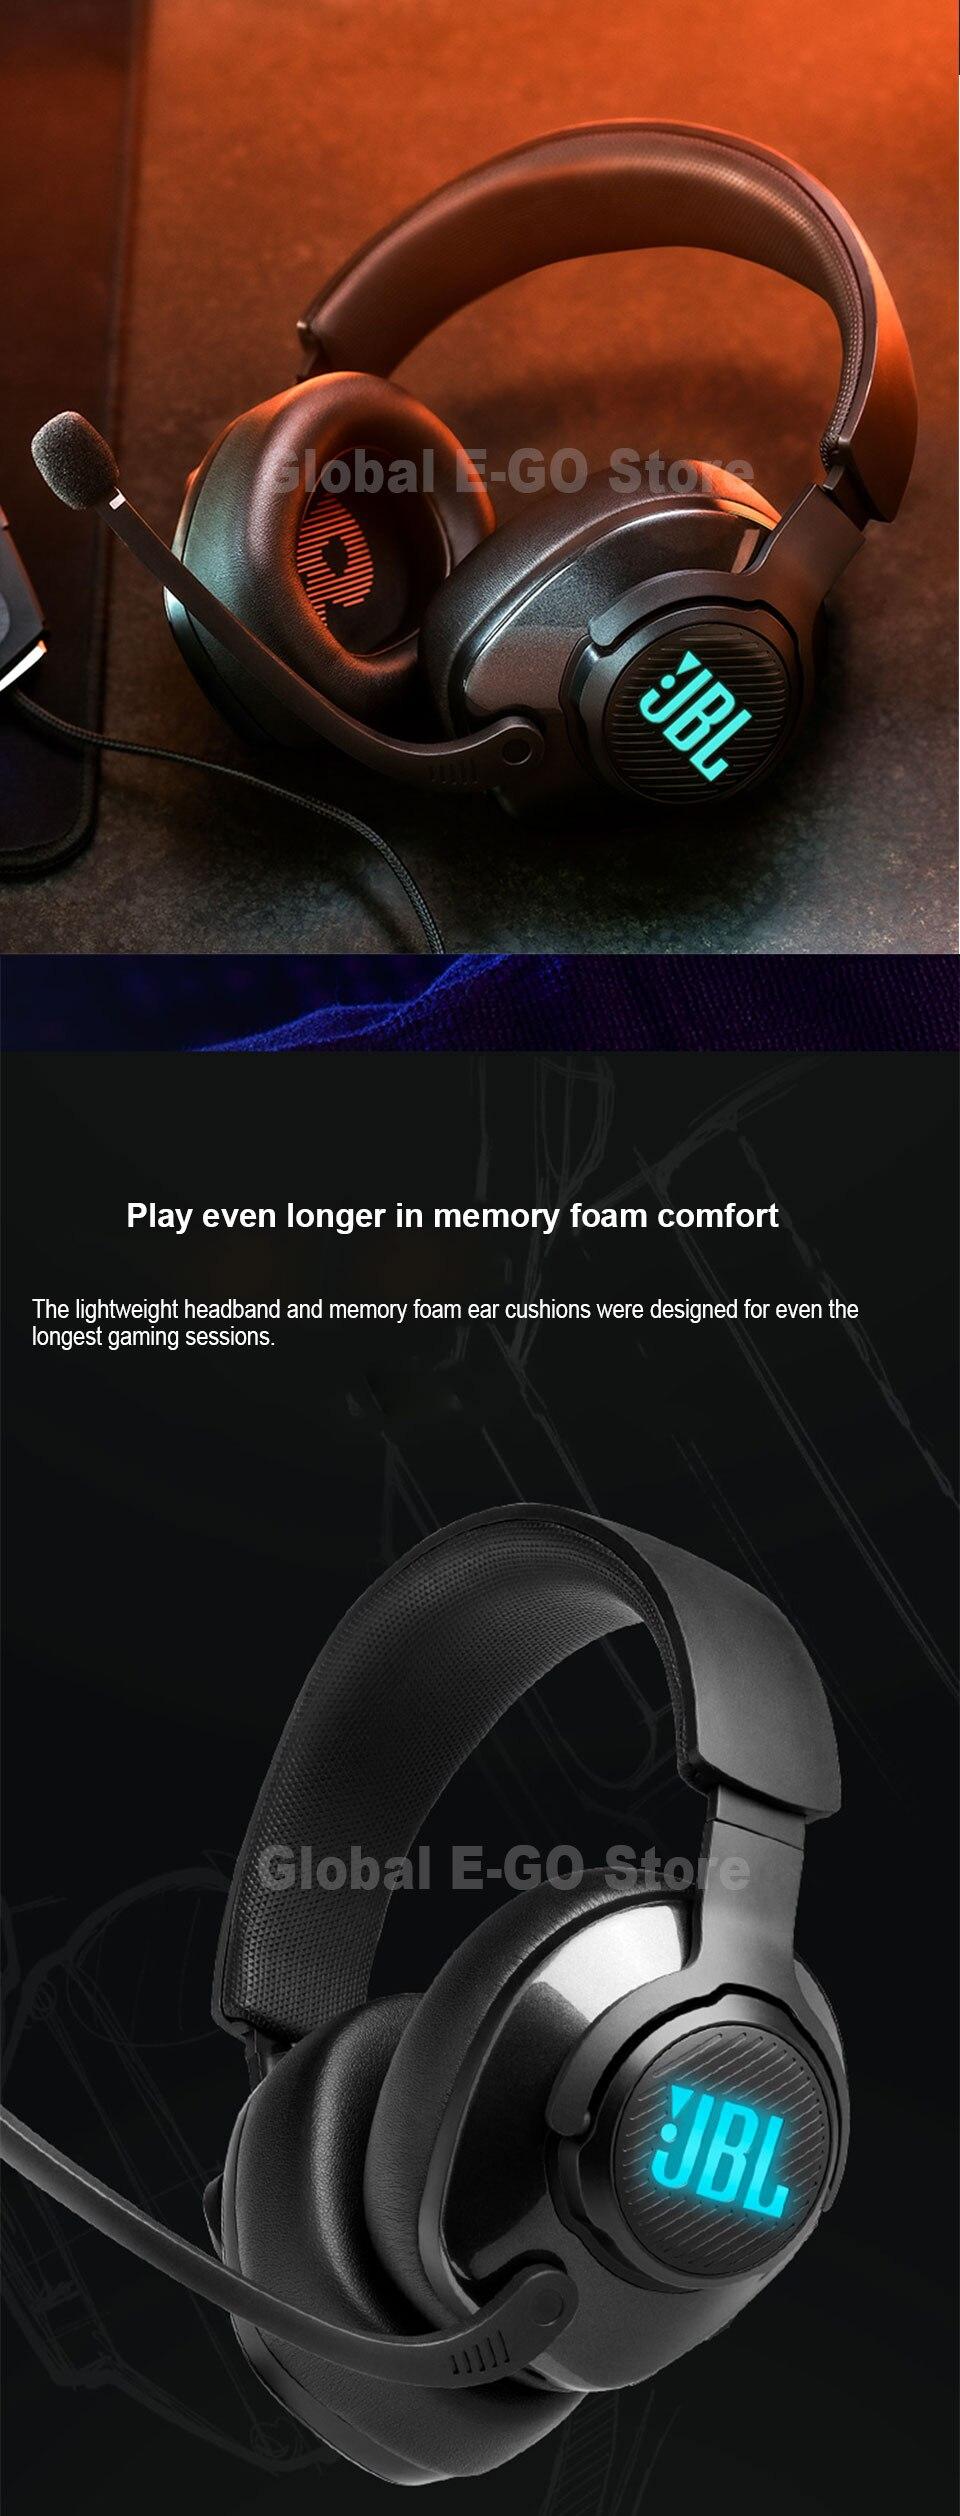 Jbl quantum 400 over-ear gaming headset com